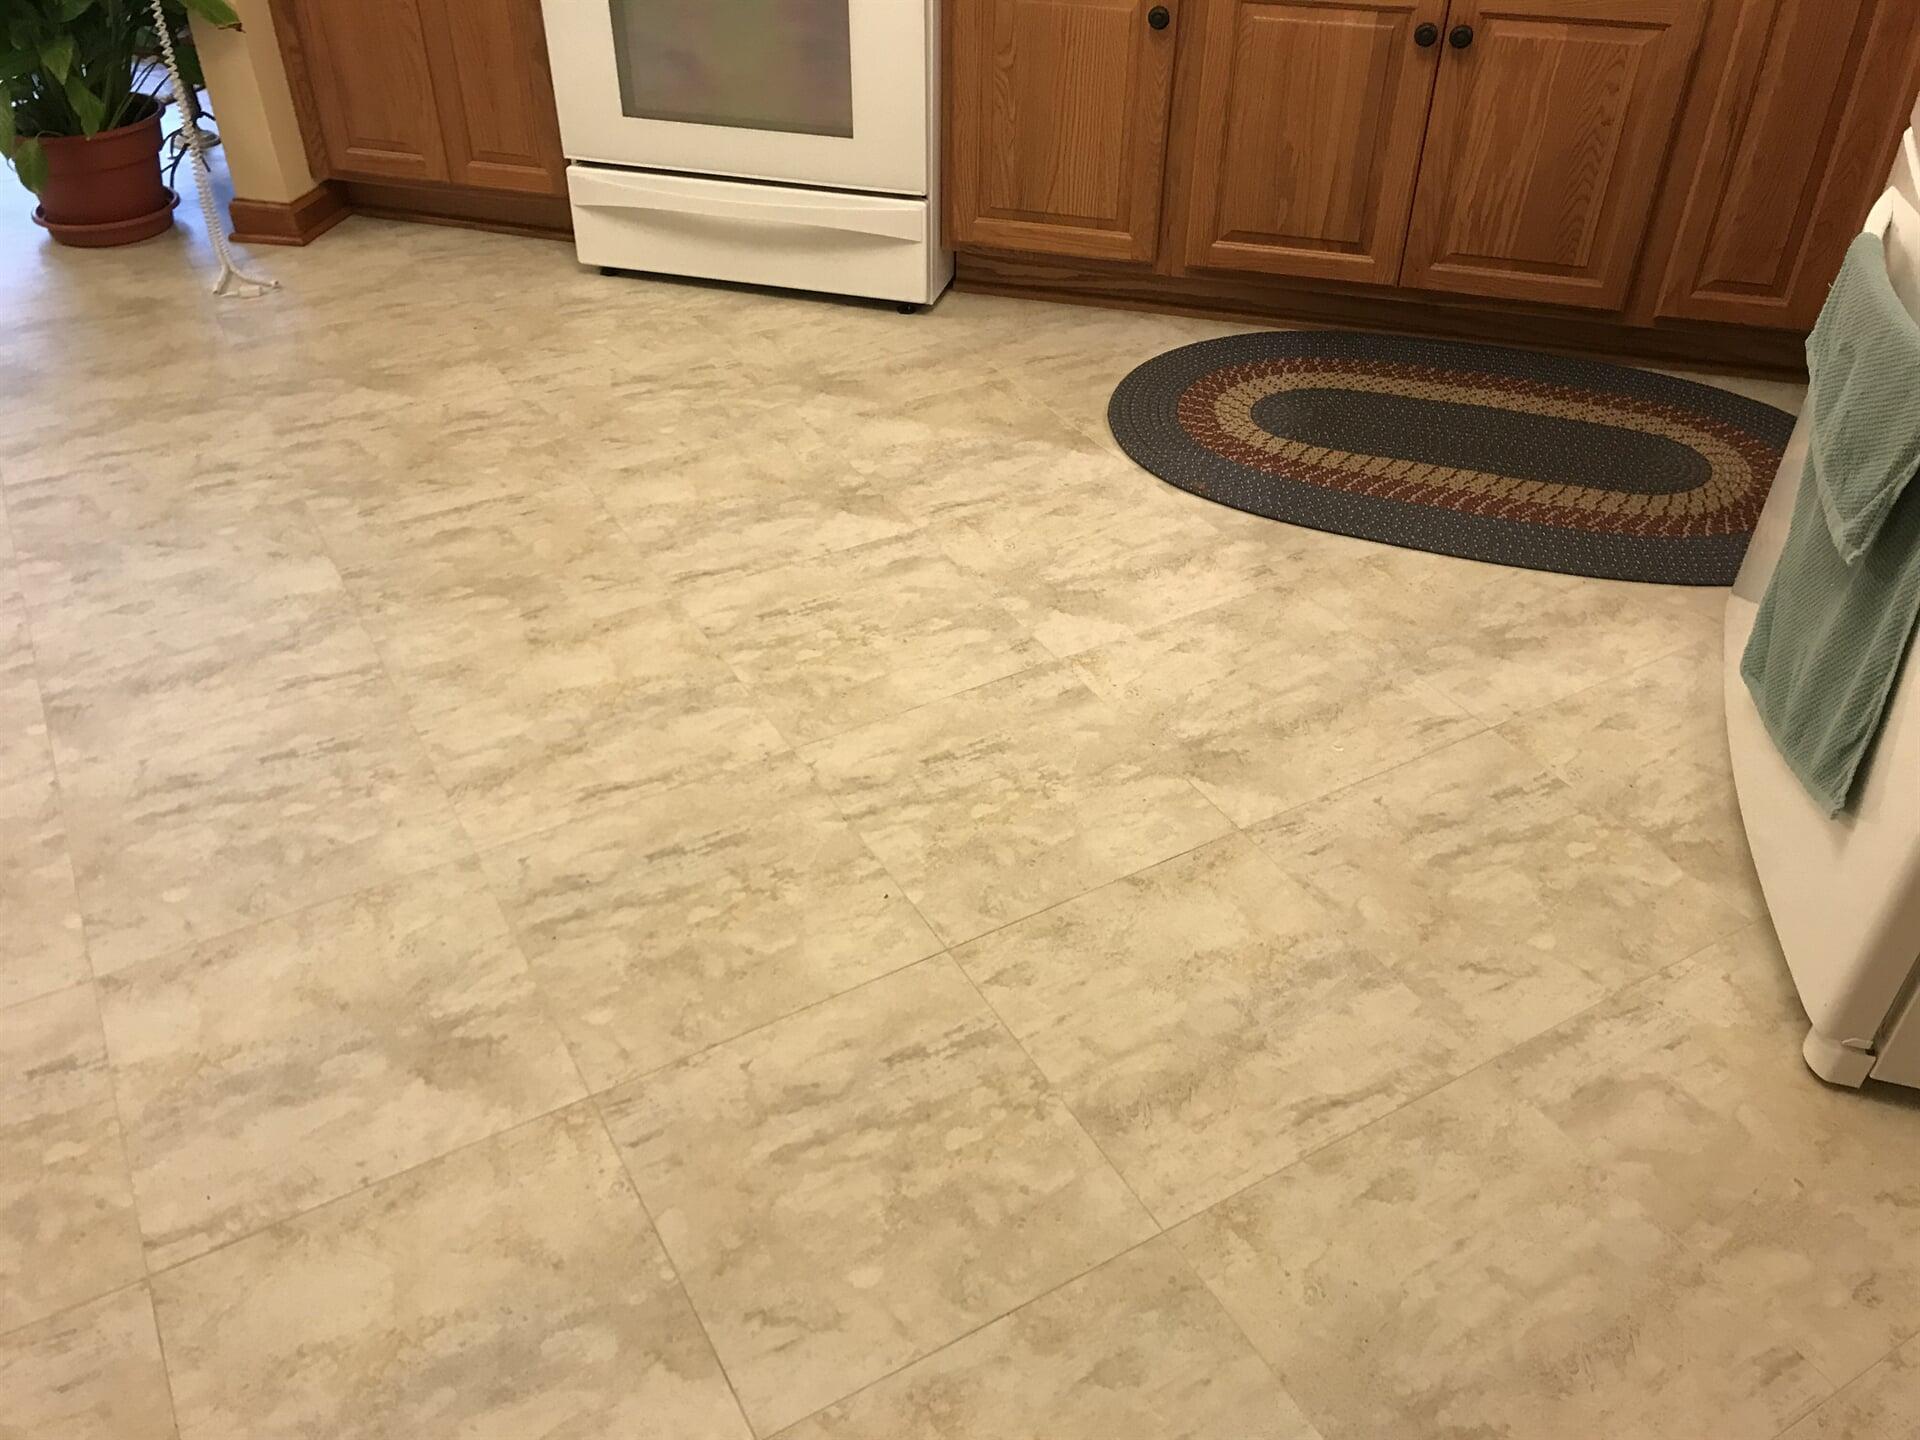 LVT kitchen flooring installation in Kankakee, IL from Marchio Tile & Carpet Inc.